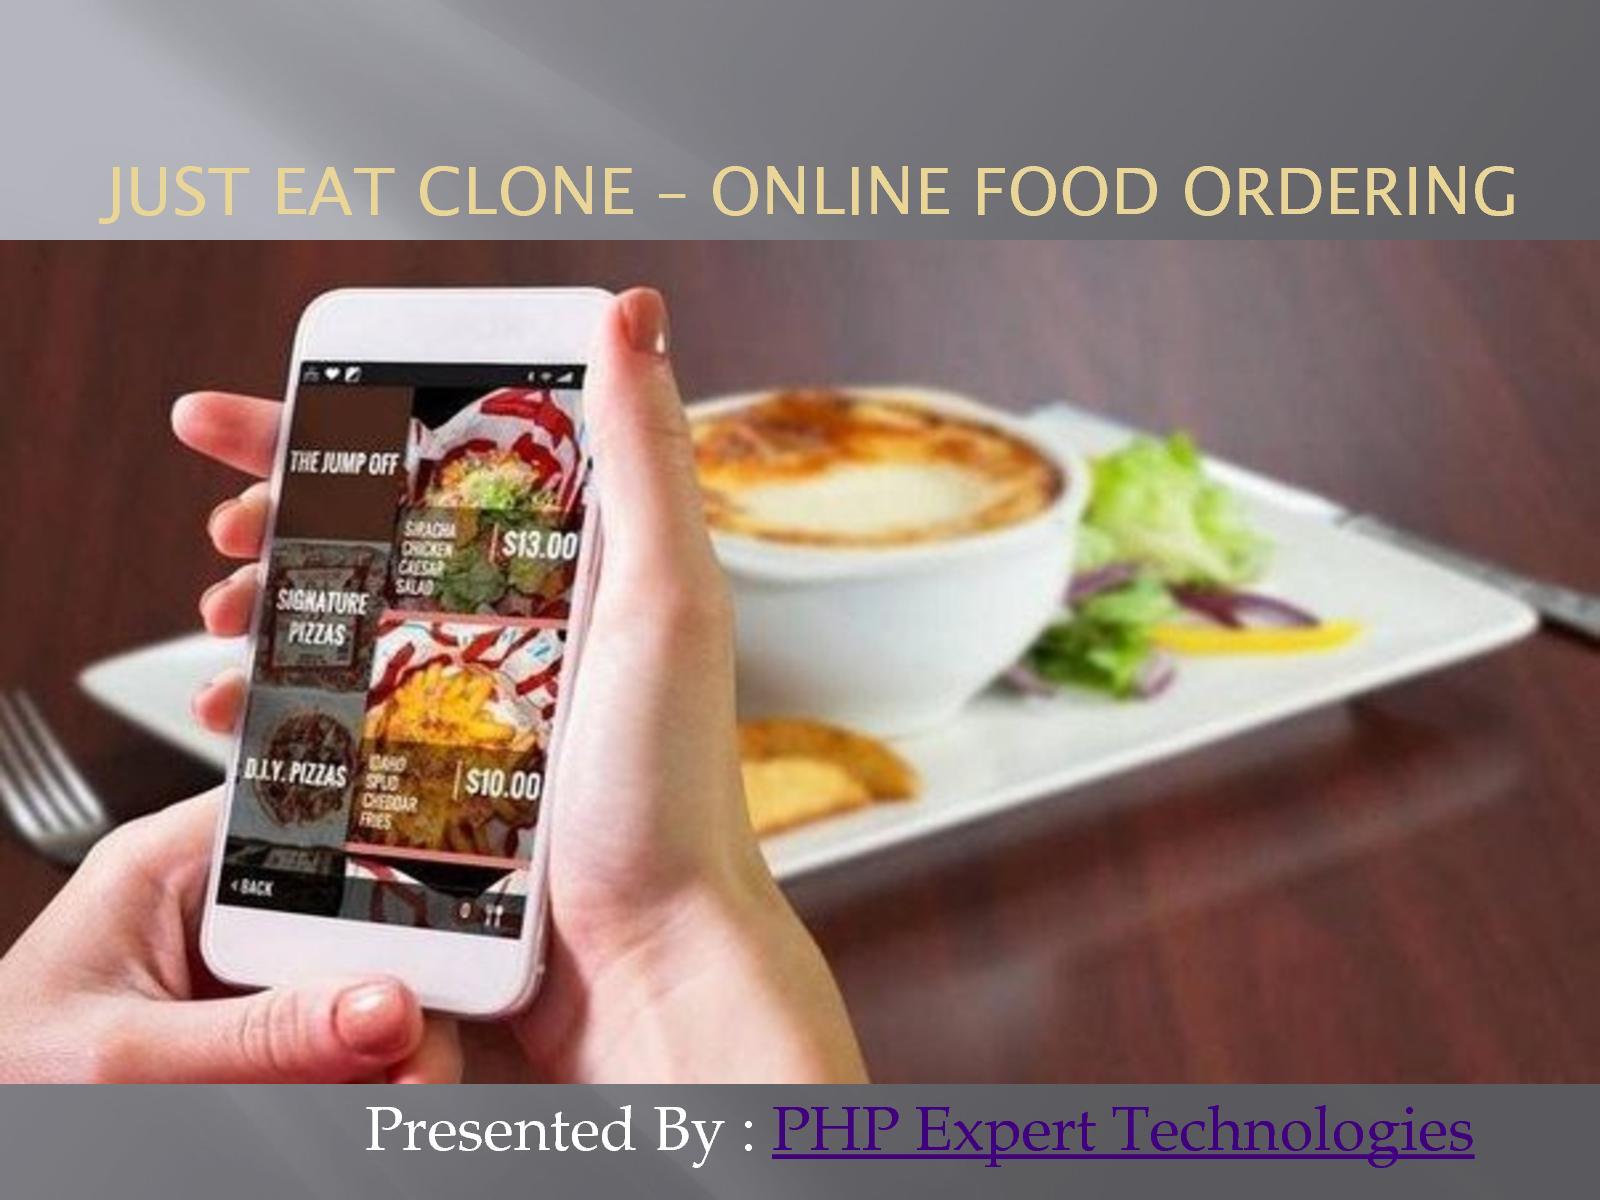 calaméo just eat clone \u2013 online food ordering solutionjust eat clone \u2013 online food ordering solution